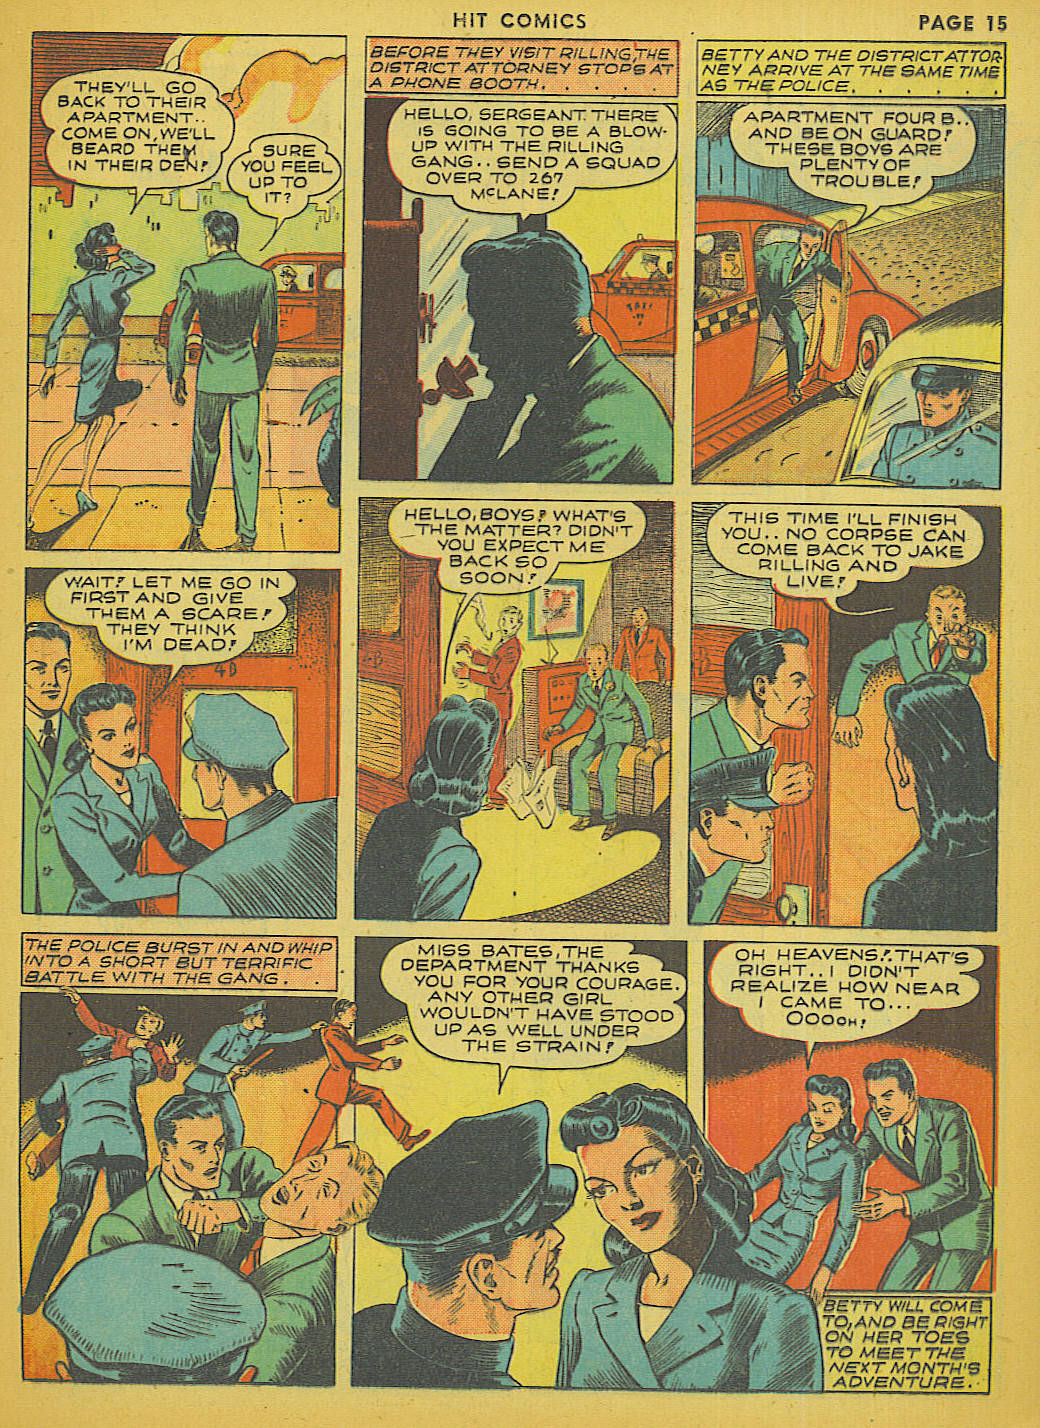 Read online Hit Comics comic -  Issue #13 - 17